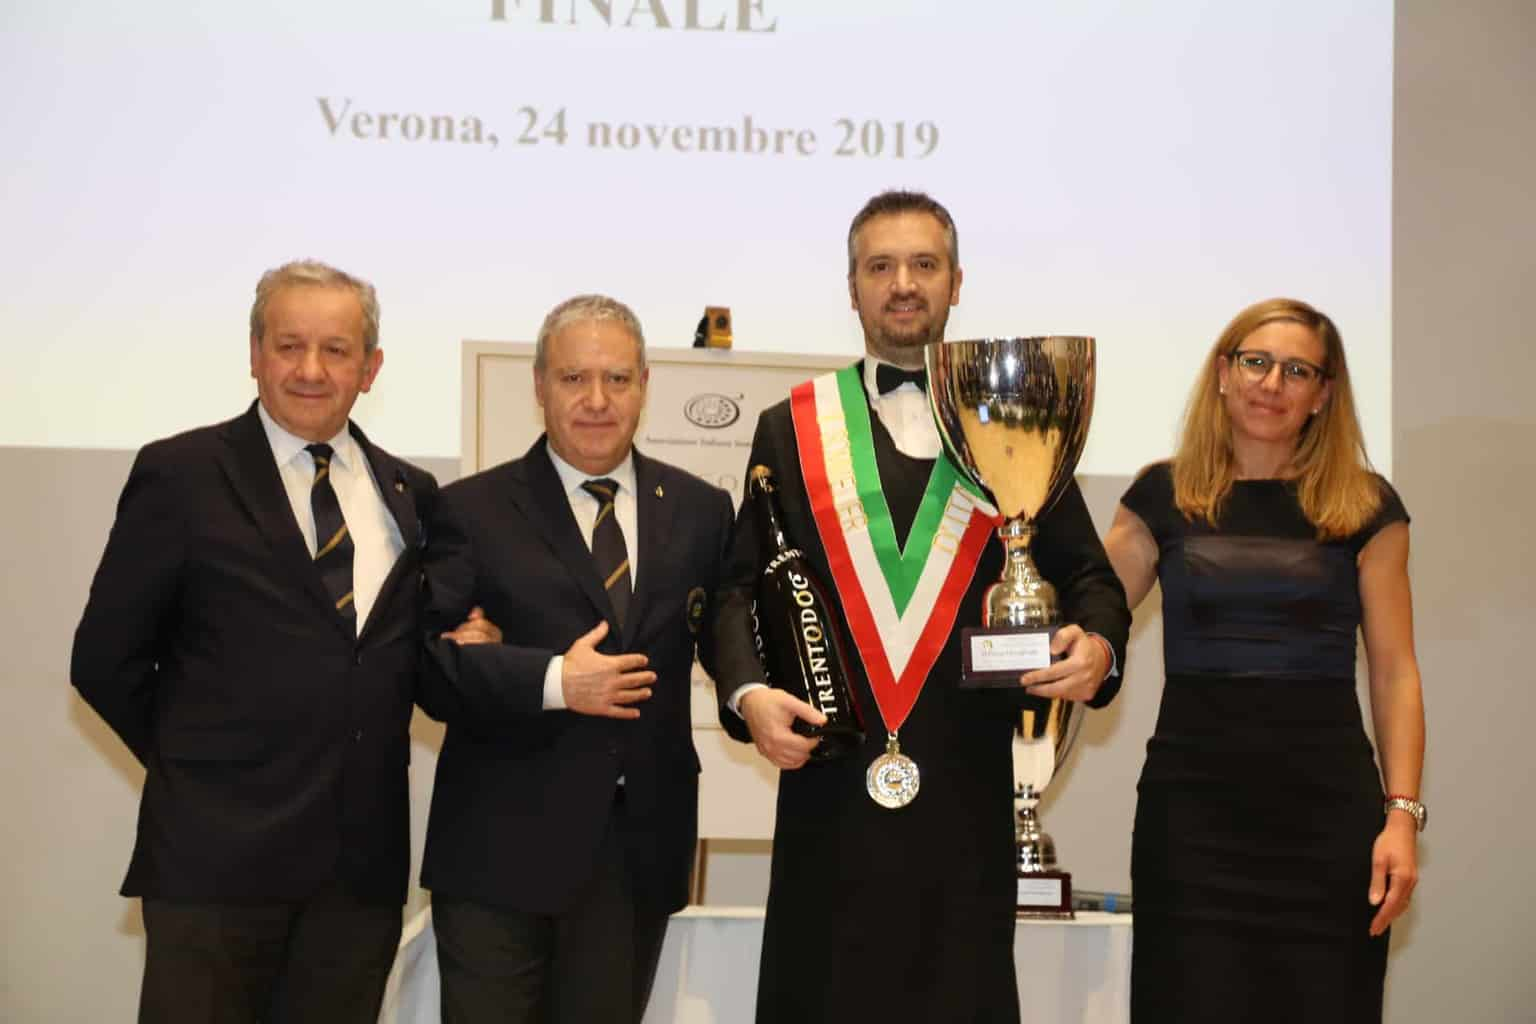 Premio Miglior Sommelier d'Italia